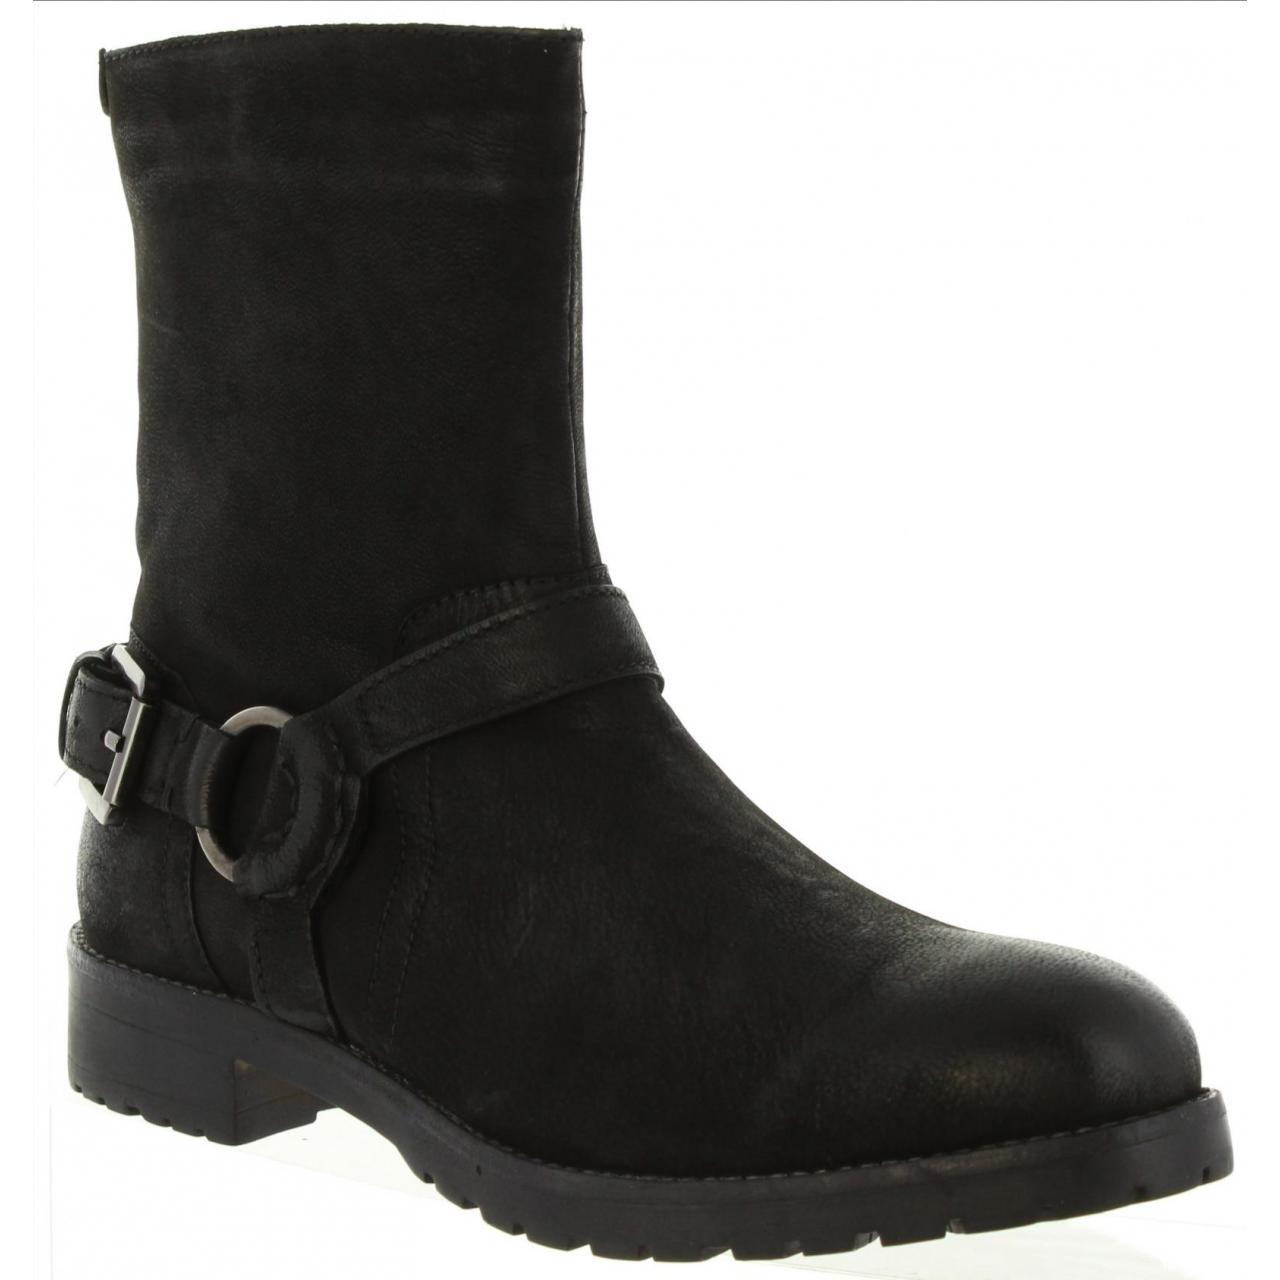 Kickers Women Boots 589110 50 Army 8 Noir: Amazon.co.uk